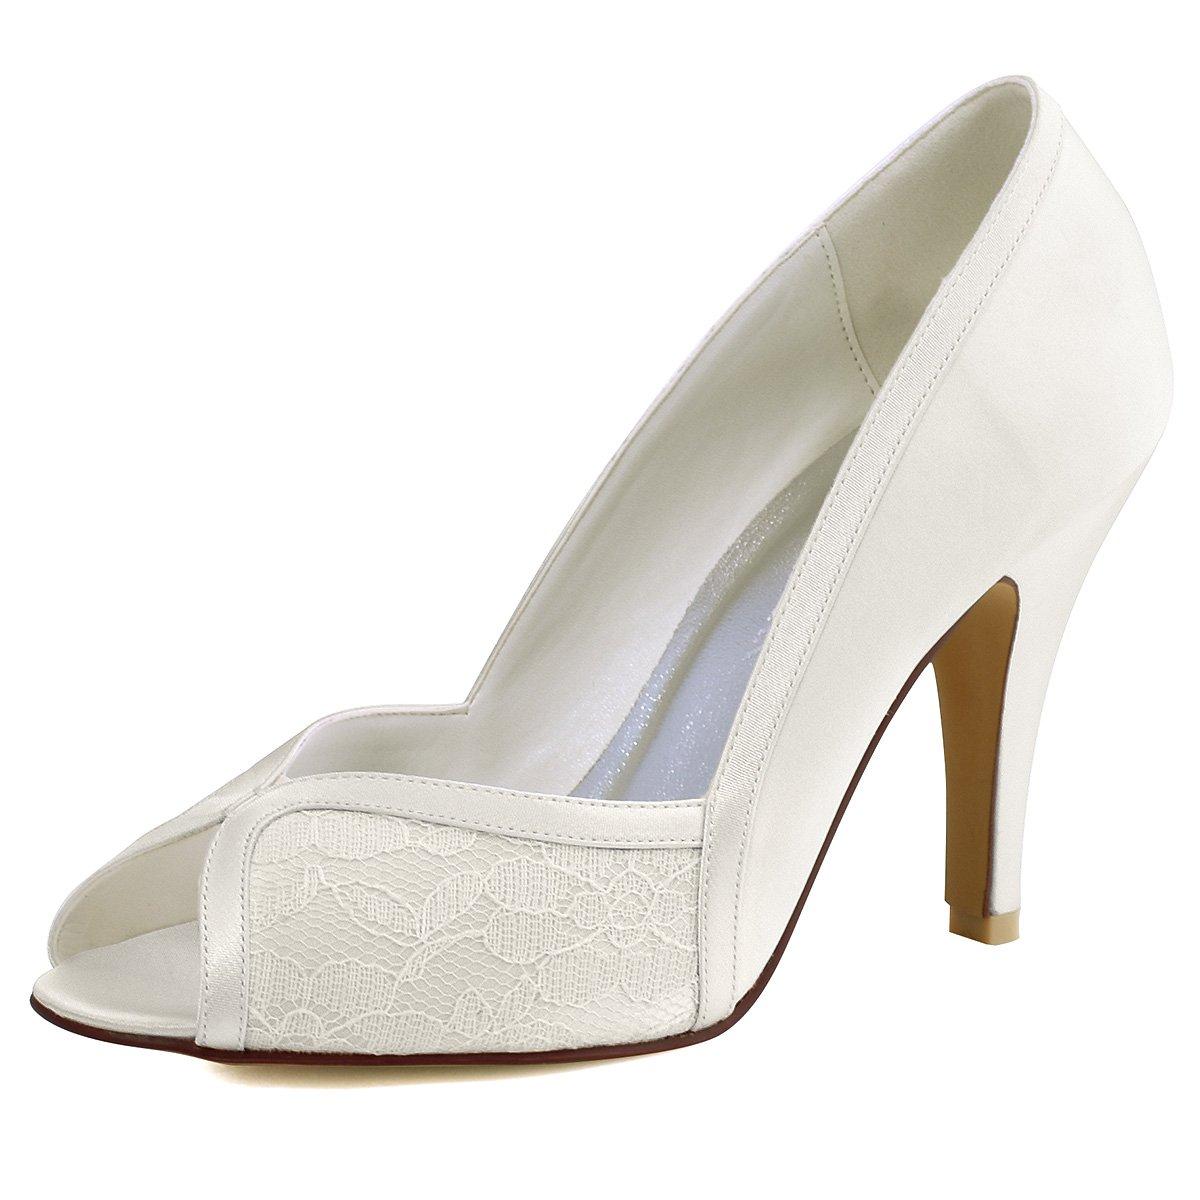 ElegantPark HP1617 Women High Heel Peep Toe Pumps Lace Wedding Bridal Shoes Ivory US 11